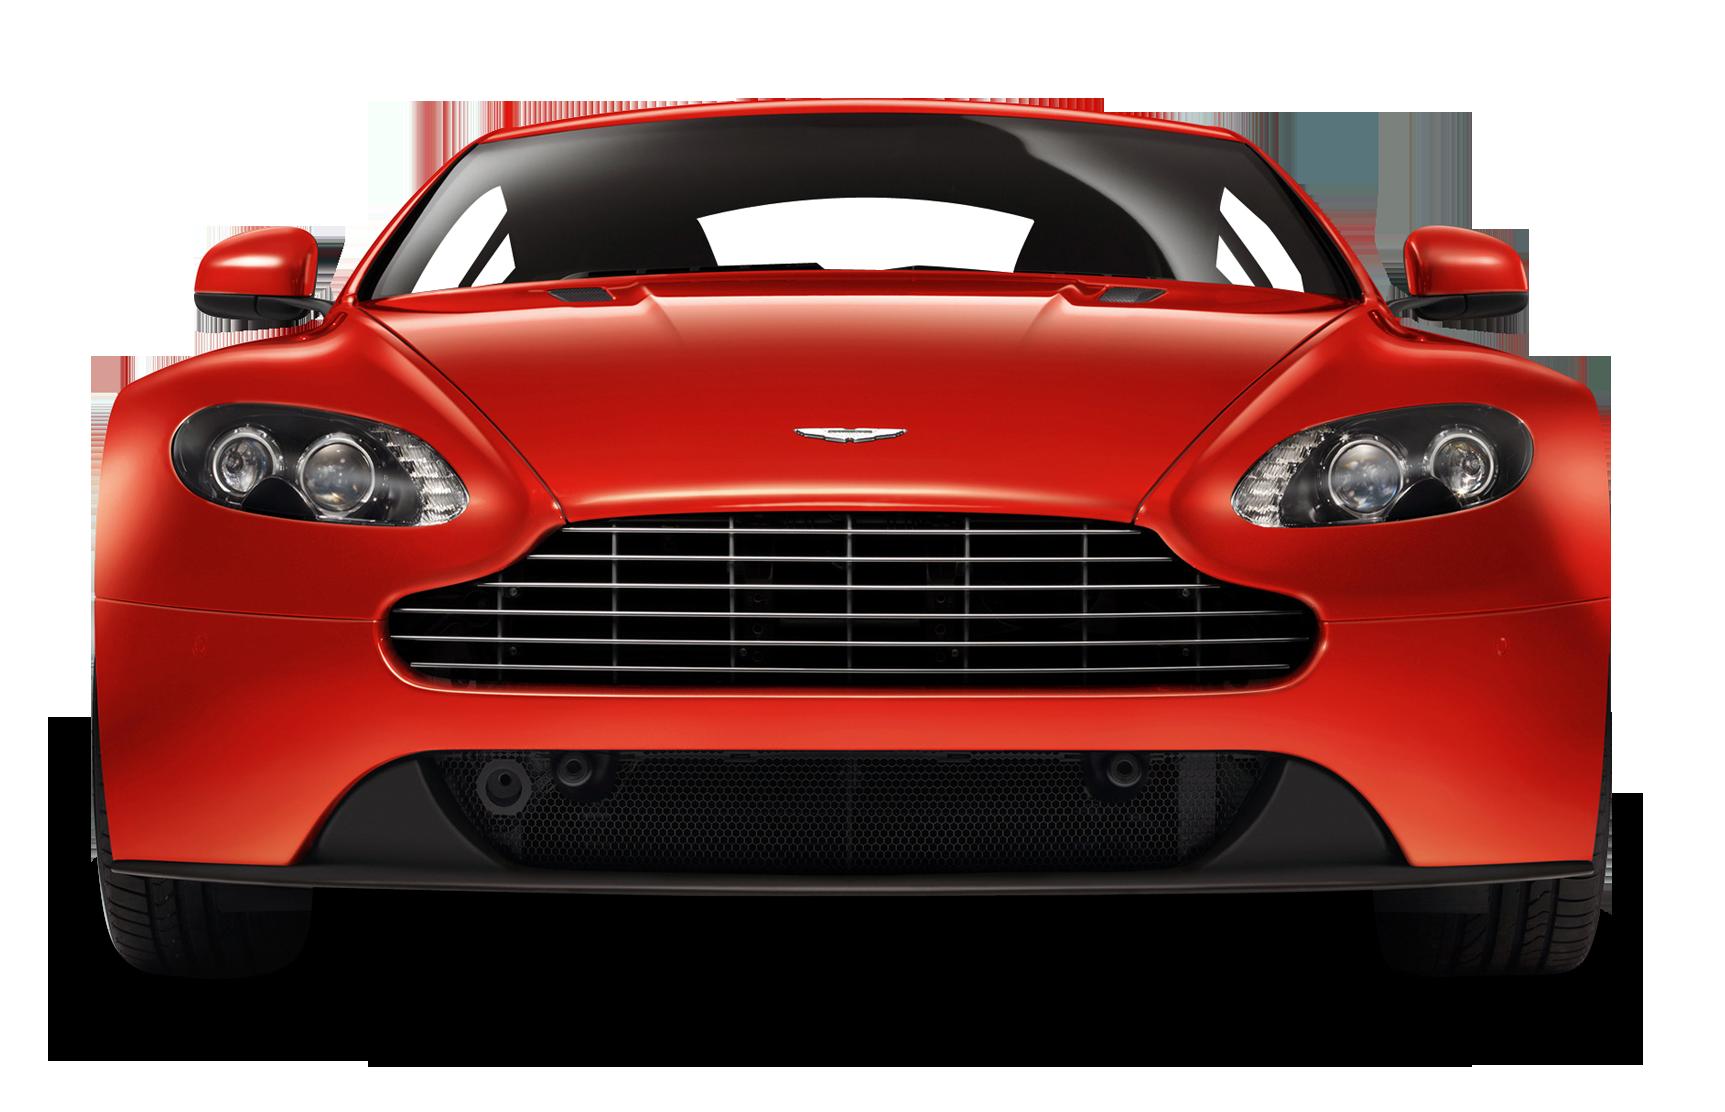 Red Aston Martin V8 Vantage Front View Car PNG Image.